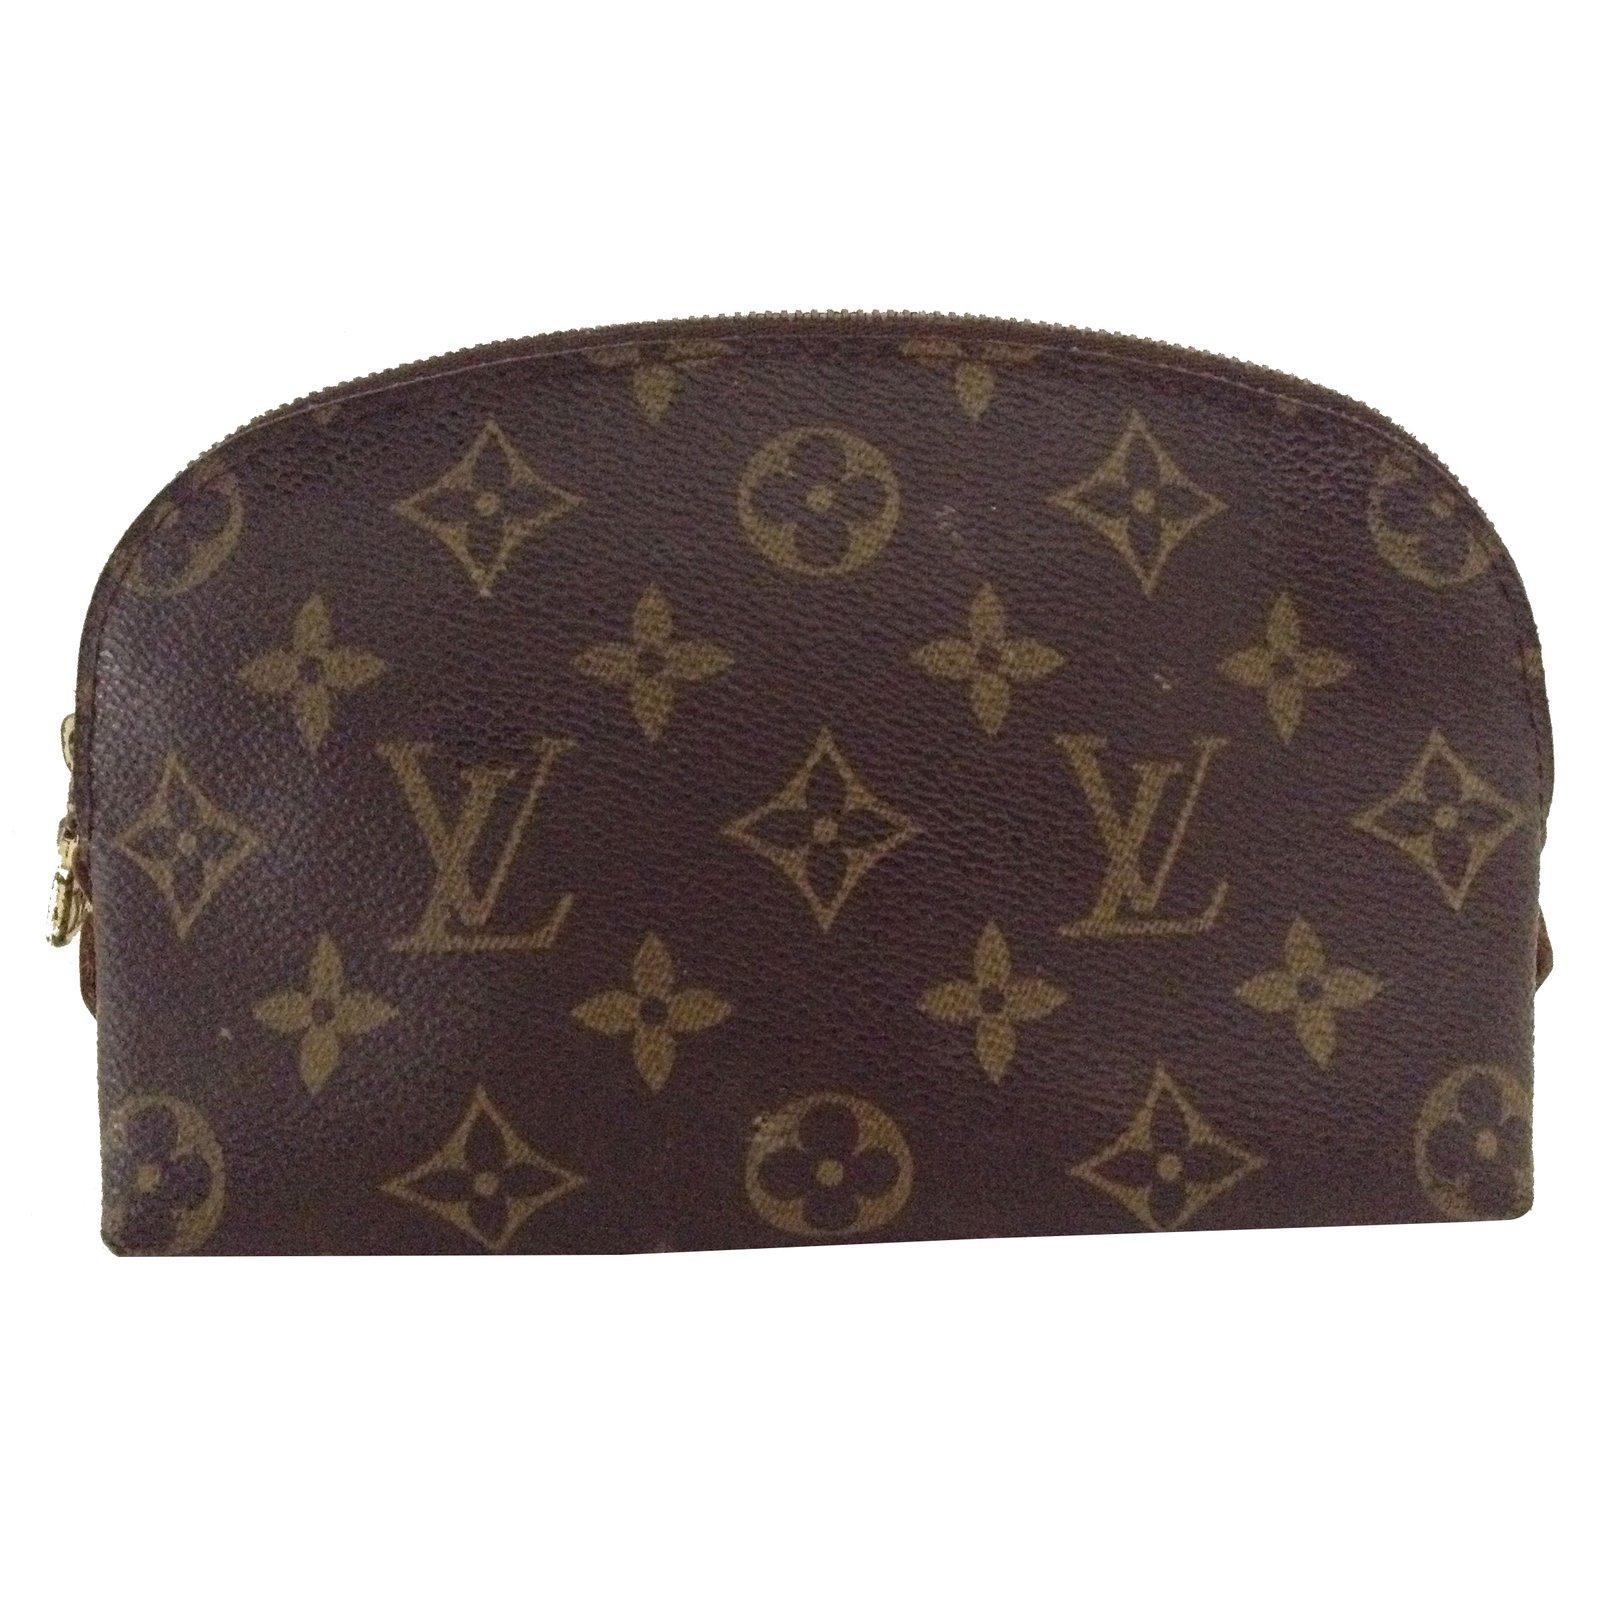 e50dadba986b Louis Vuitton Clutch bag Clutch bags Leather Brown ref.35910 - Joli ...